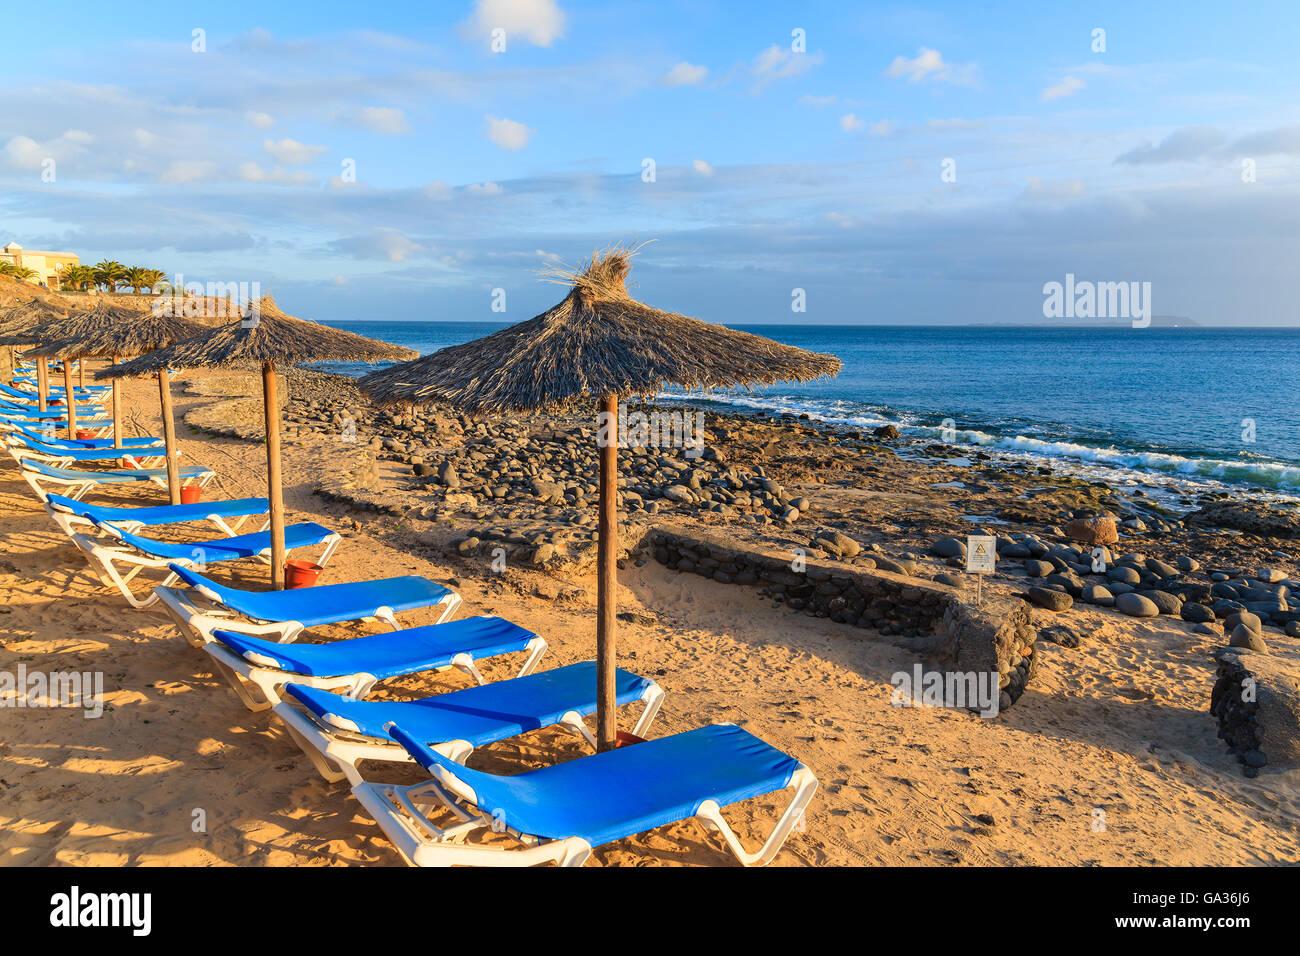 Row Of Sunbeds And Umbrellas On Playa Blanca Beach At Sunset